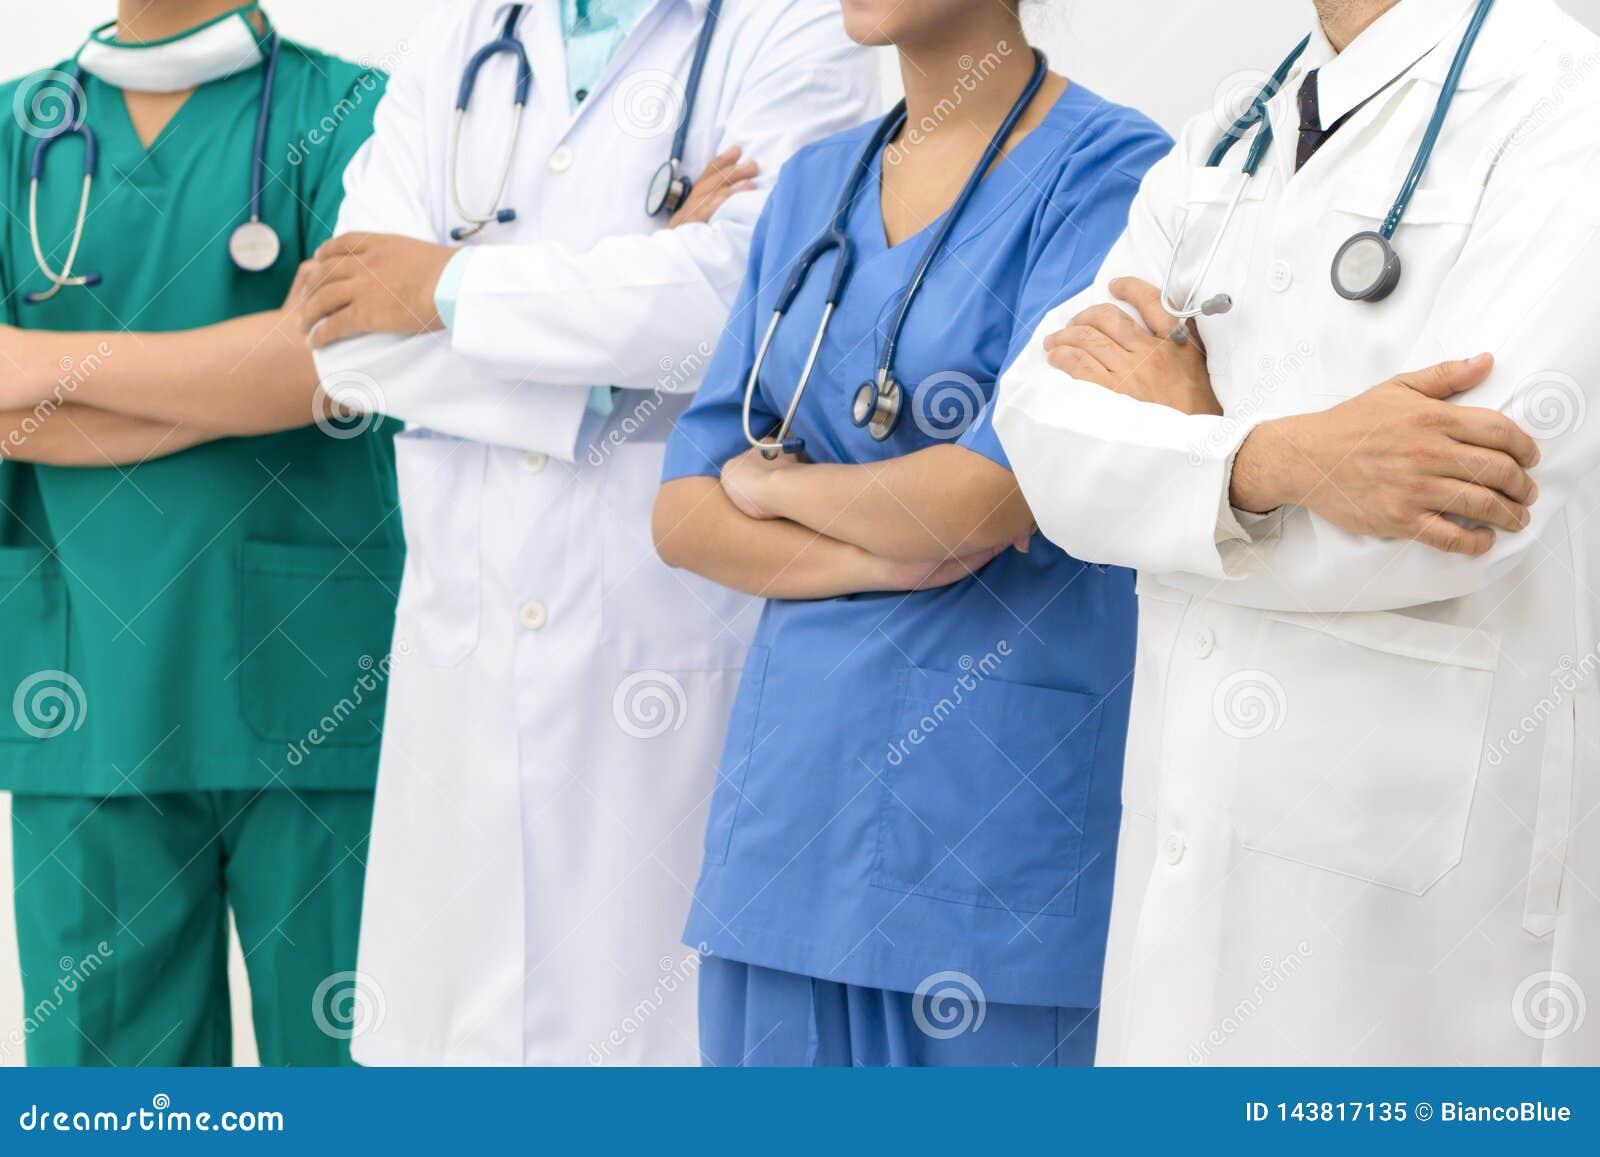 Medical people - doctors, nurse and surgeon